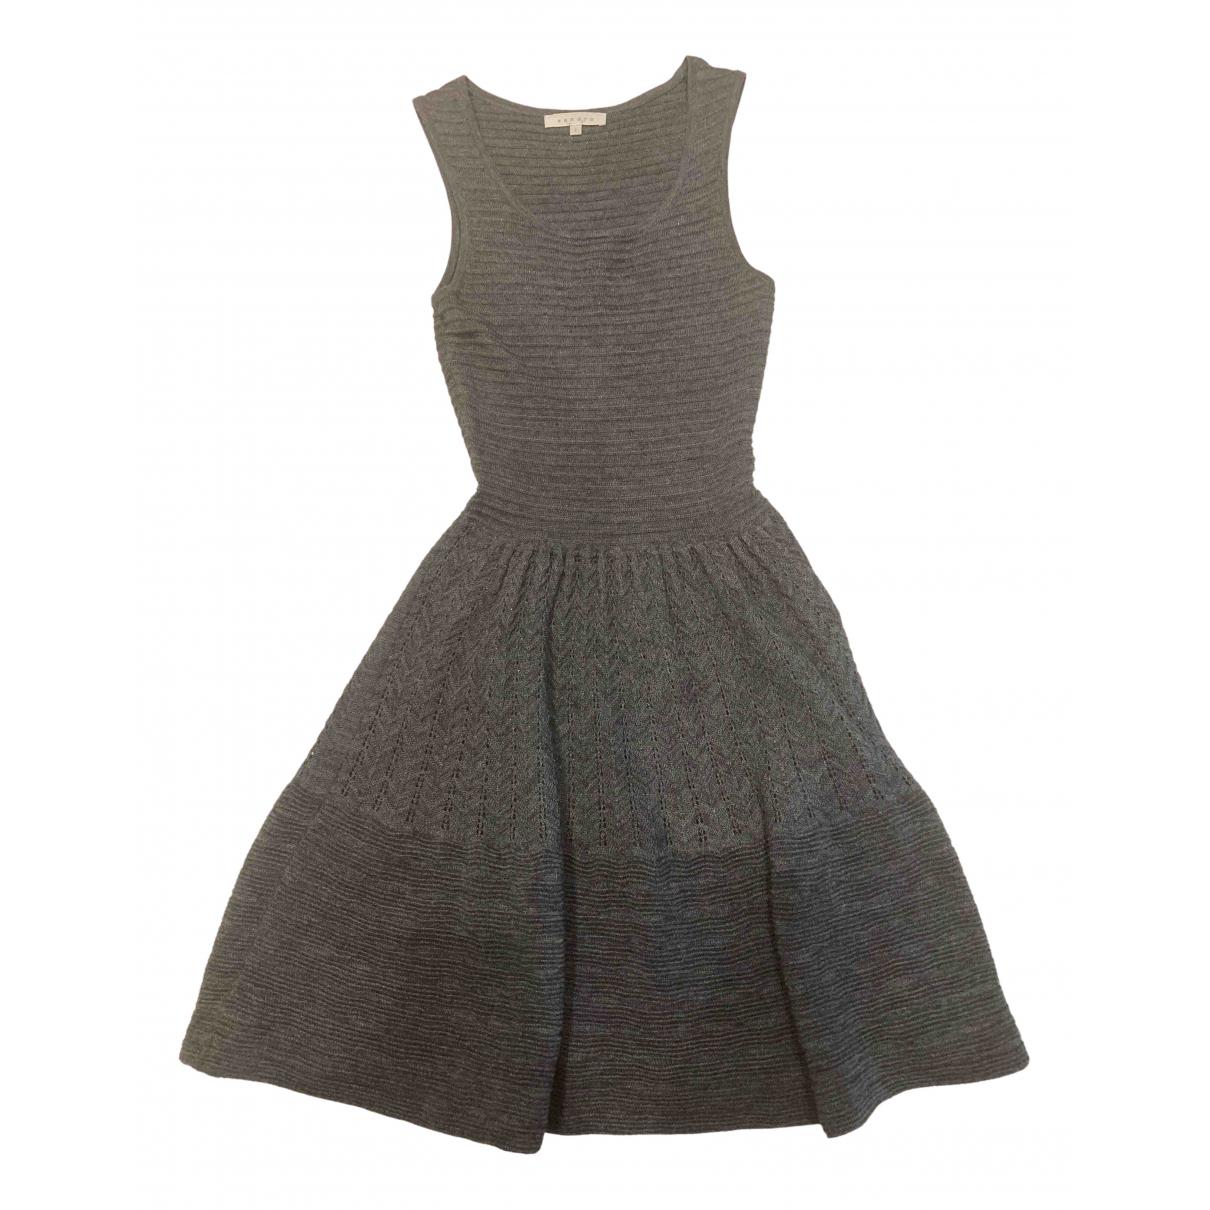 Sandro \N Grey Wool dress for Women 1 0-5